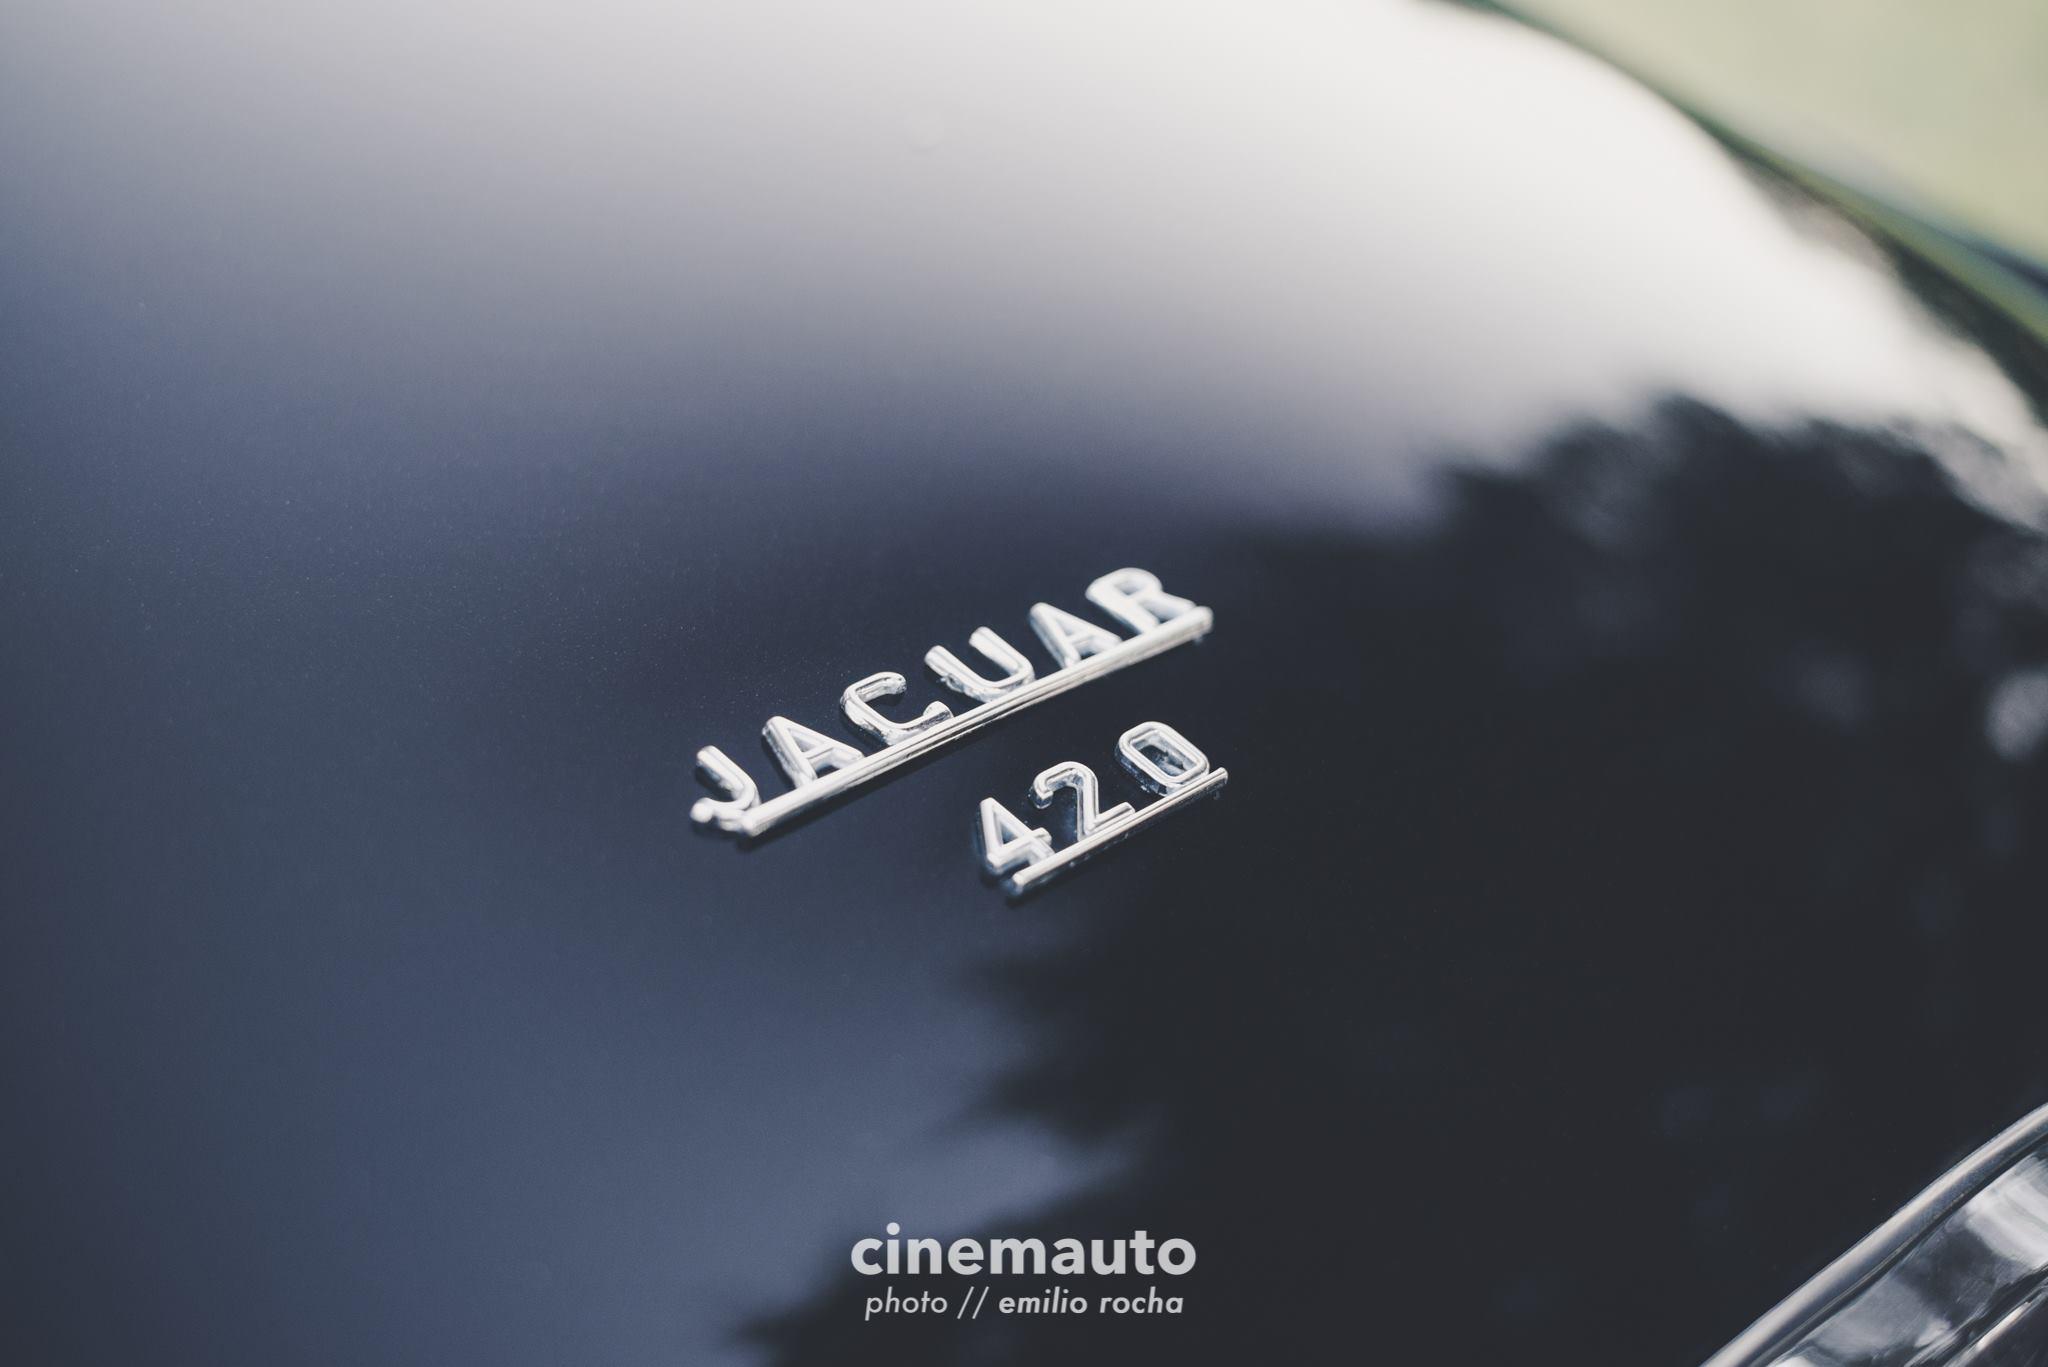 cinemauto-er4.jpg